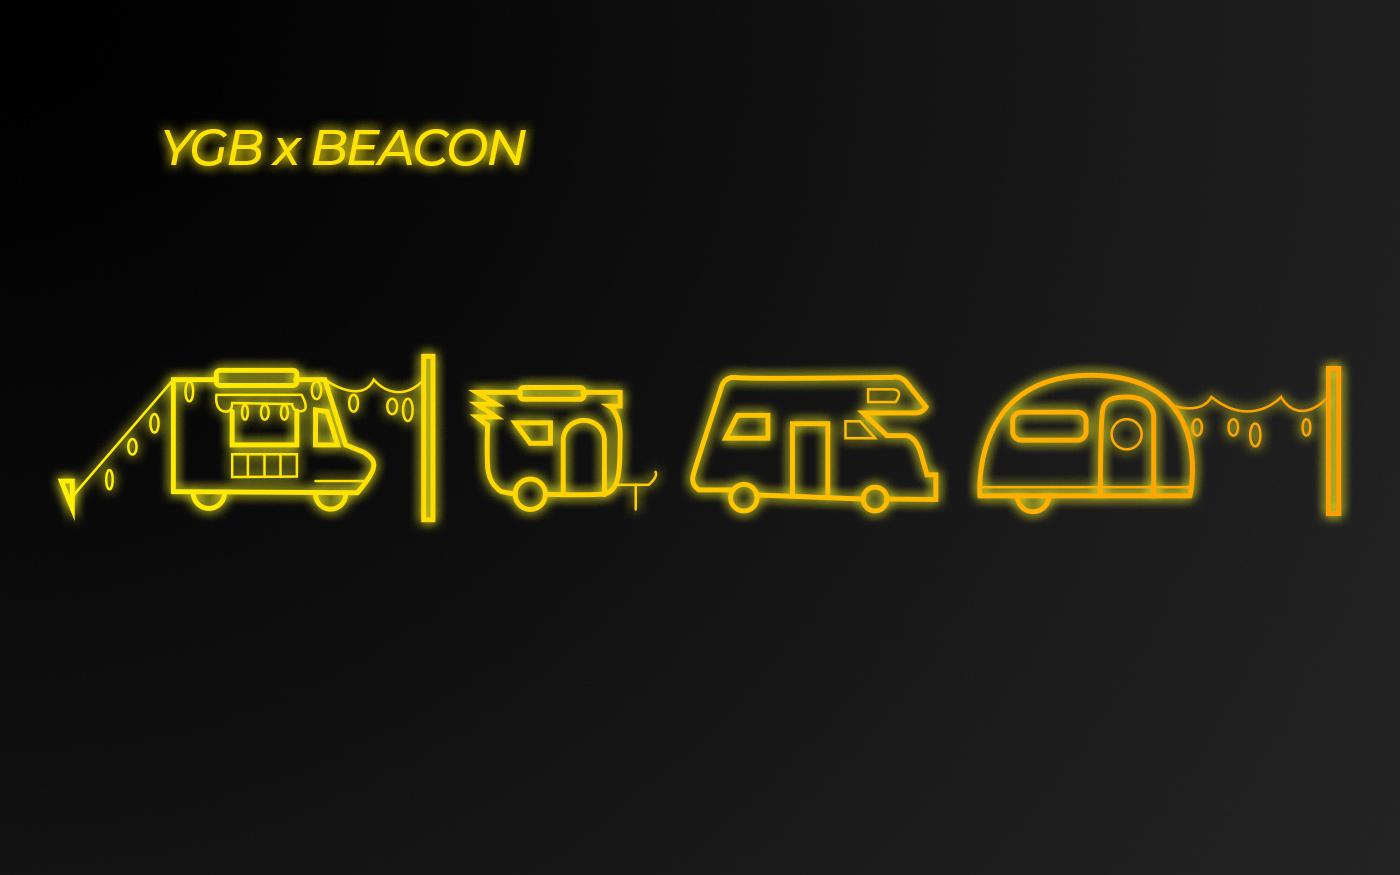 YGBxBeacon Neon Spread(Yellow).jpg